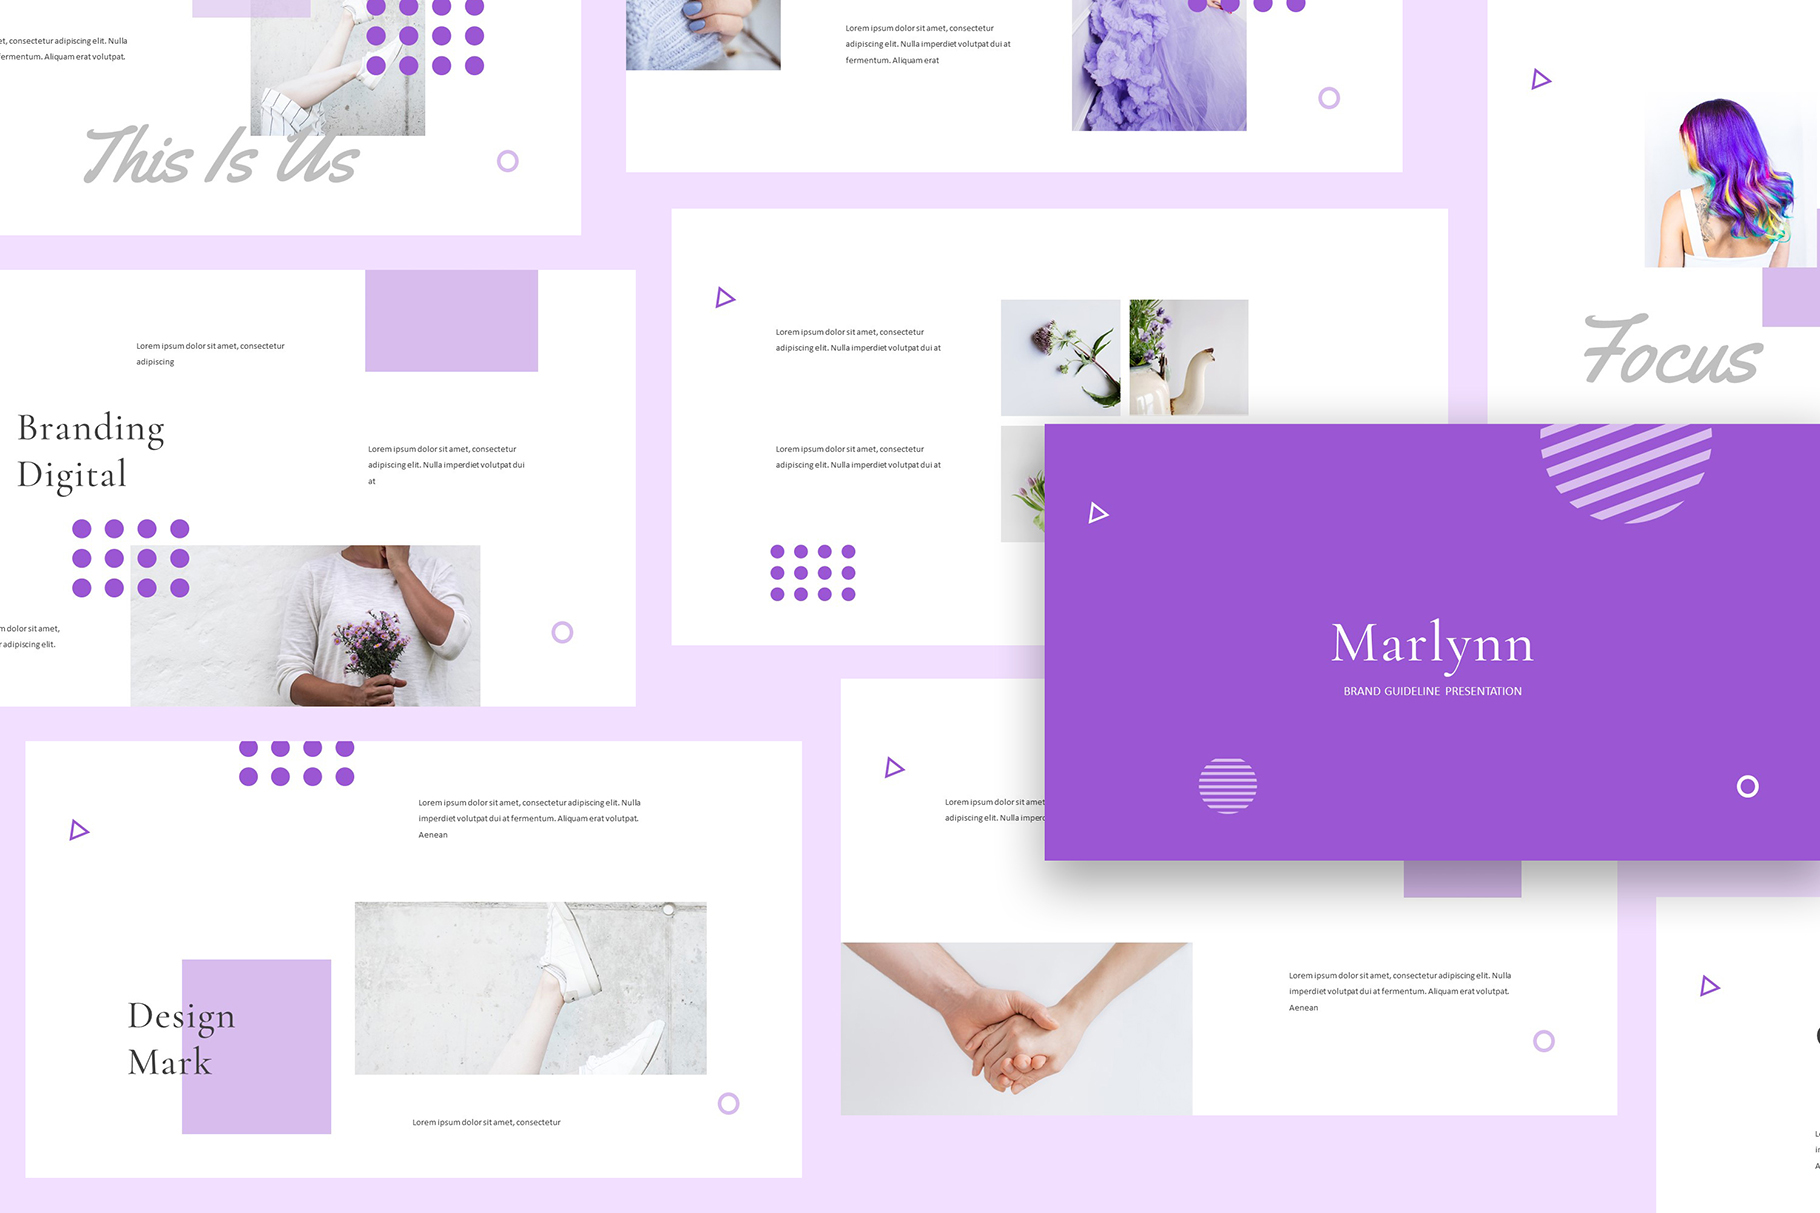 Marlynn Brand Guidelines Googleslide example image 4